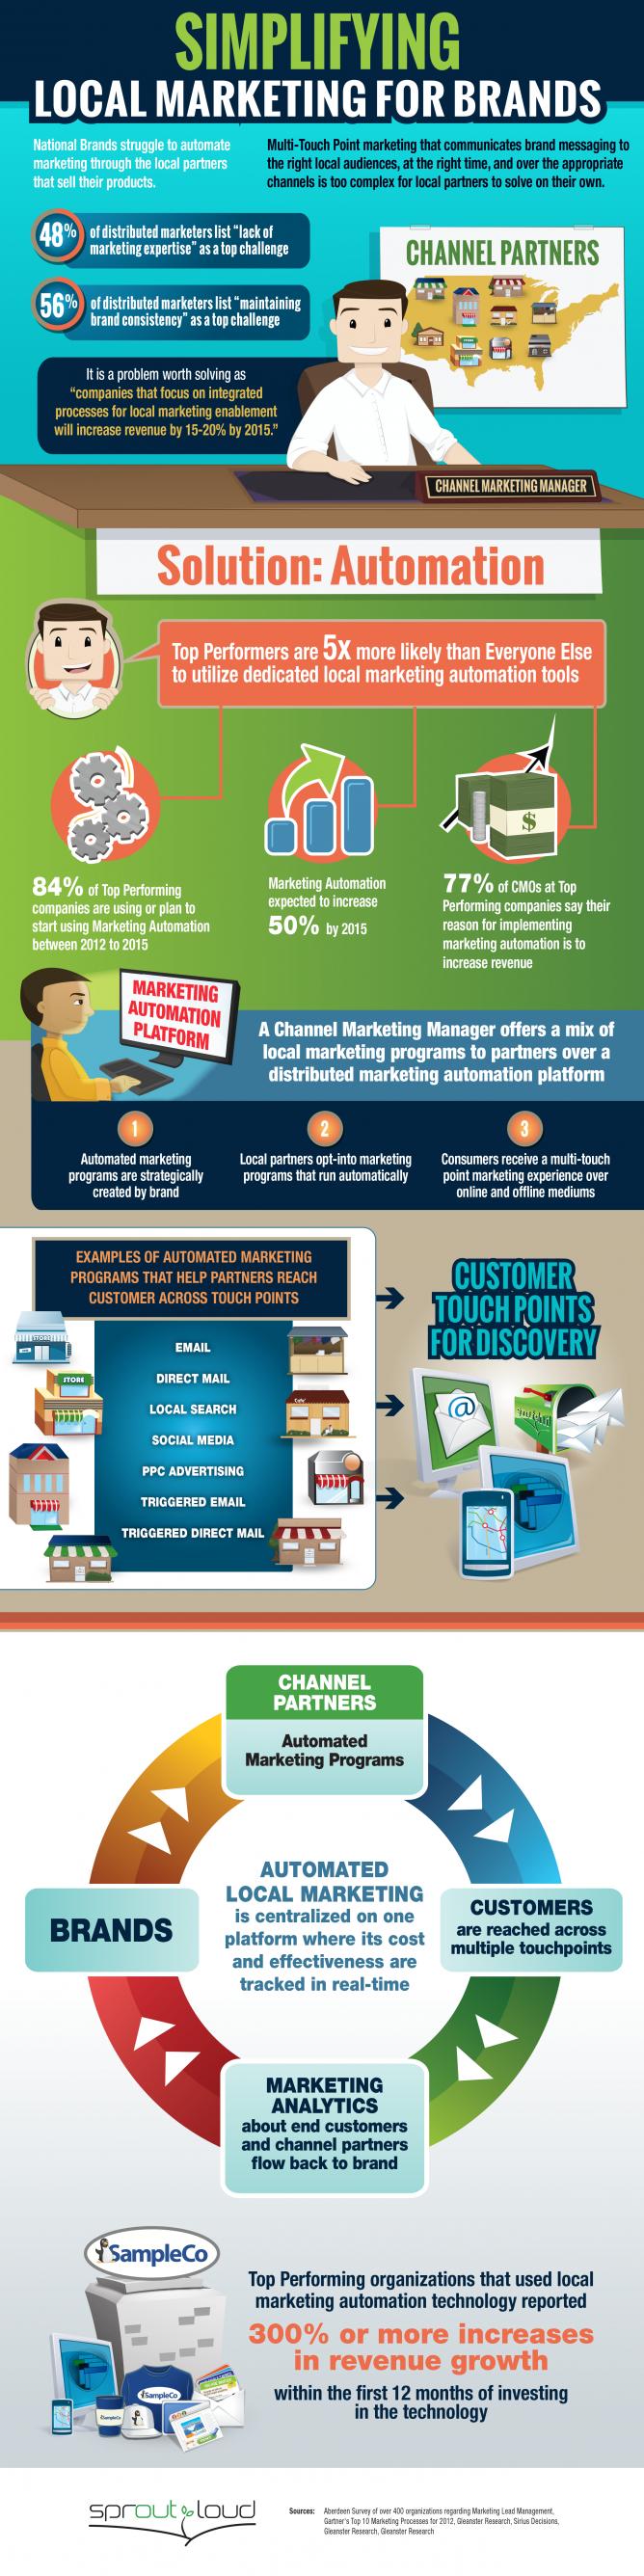 Brand-local-marketing-automation